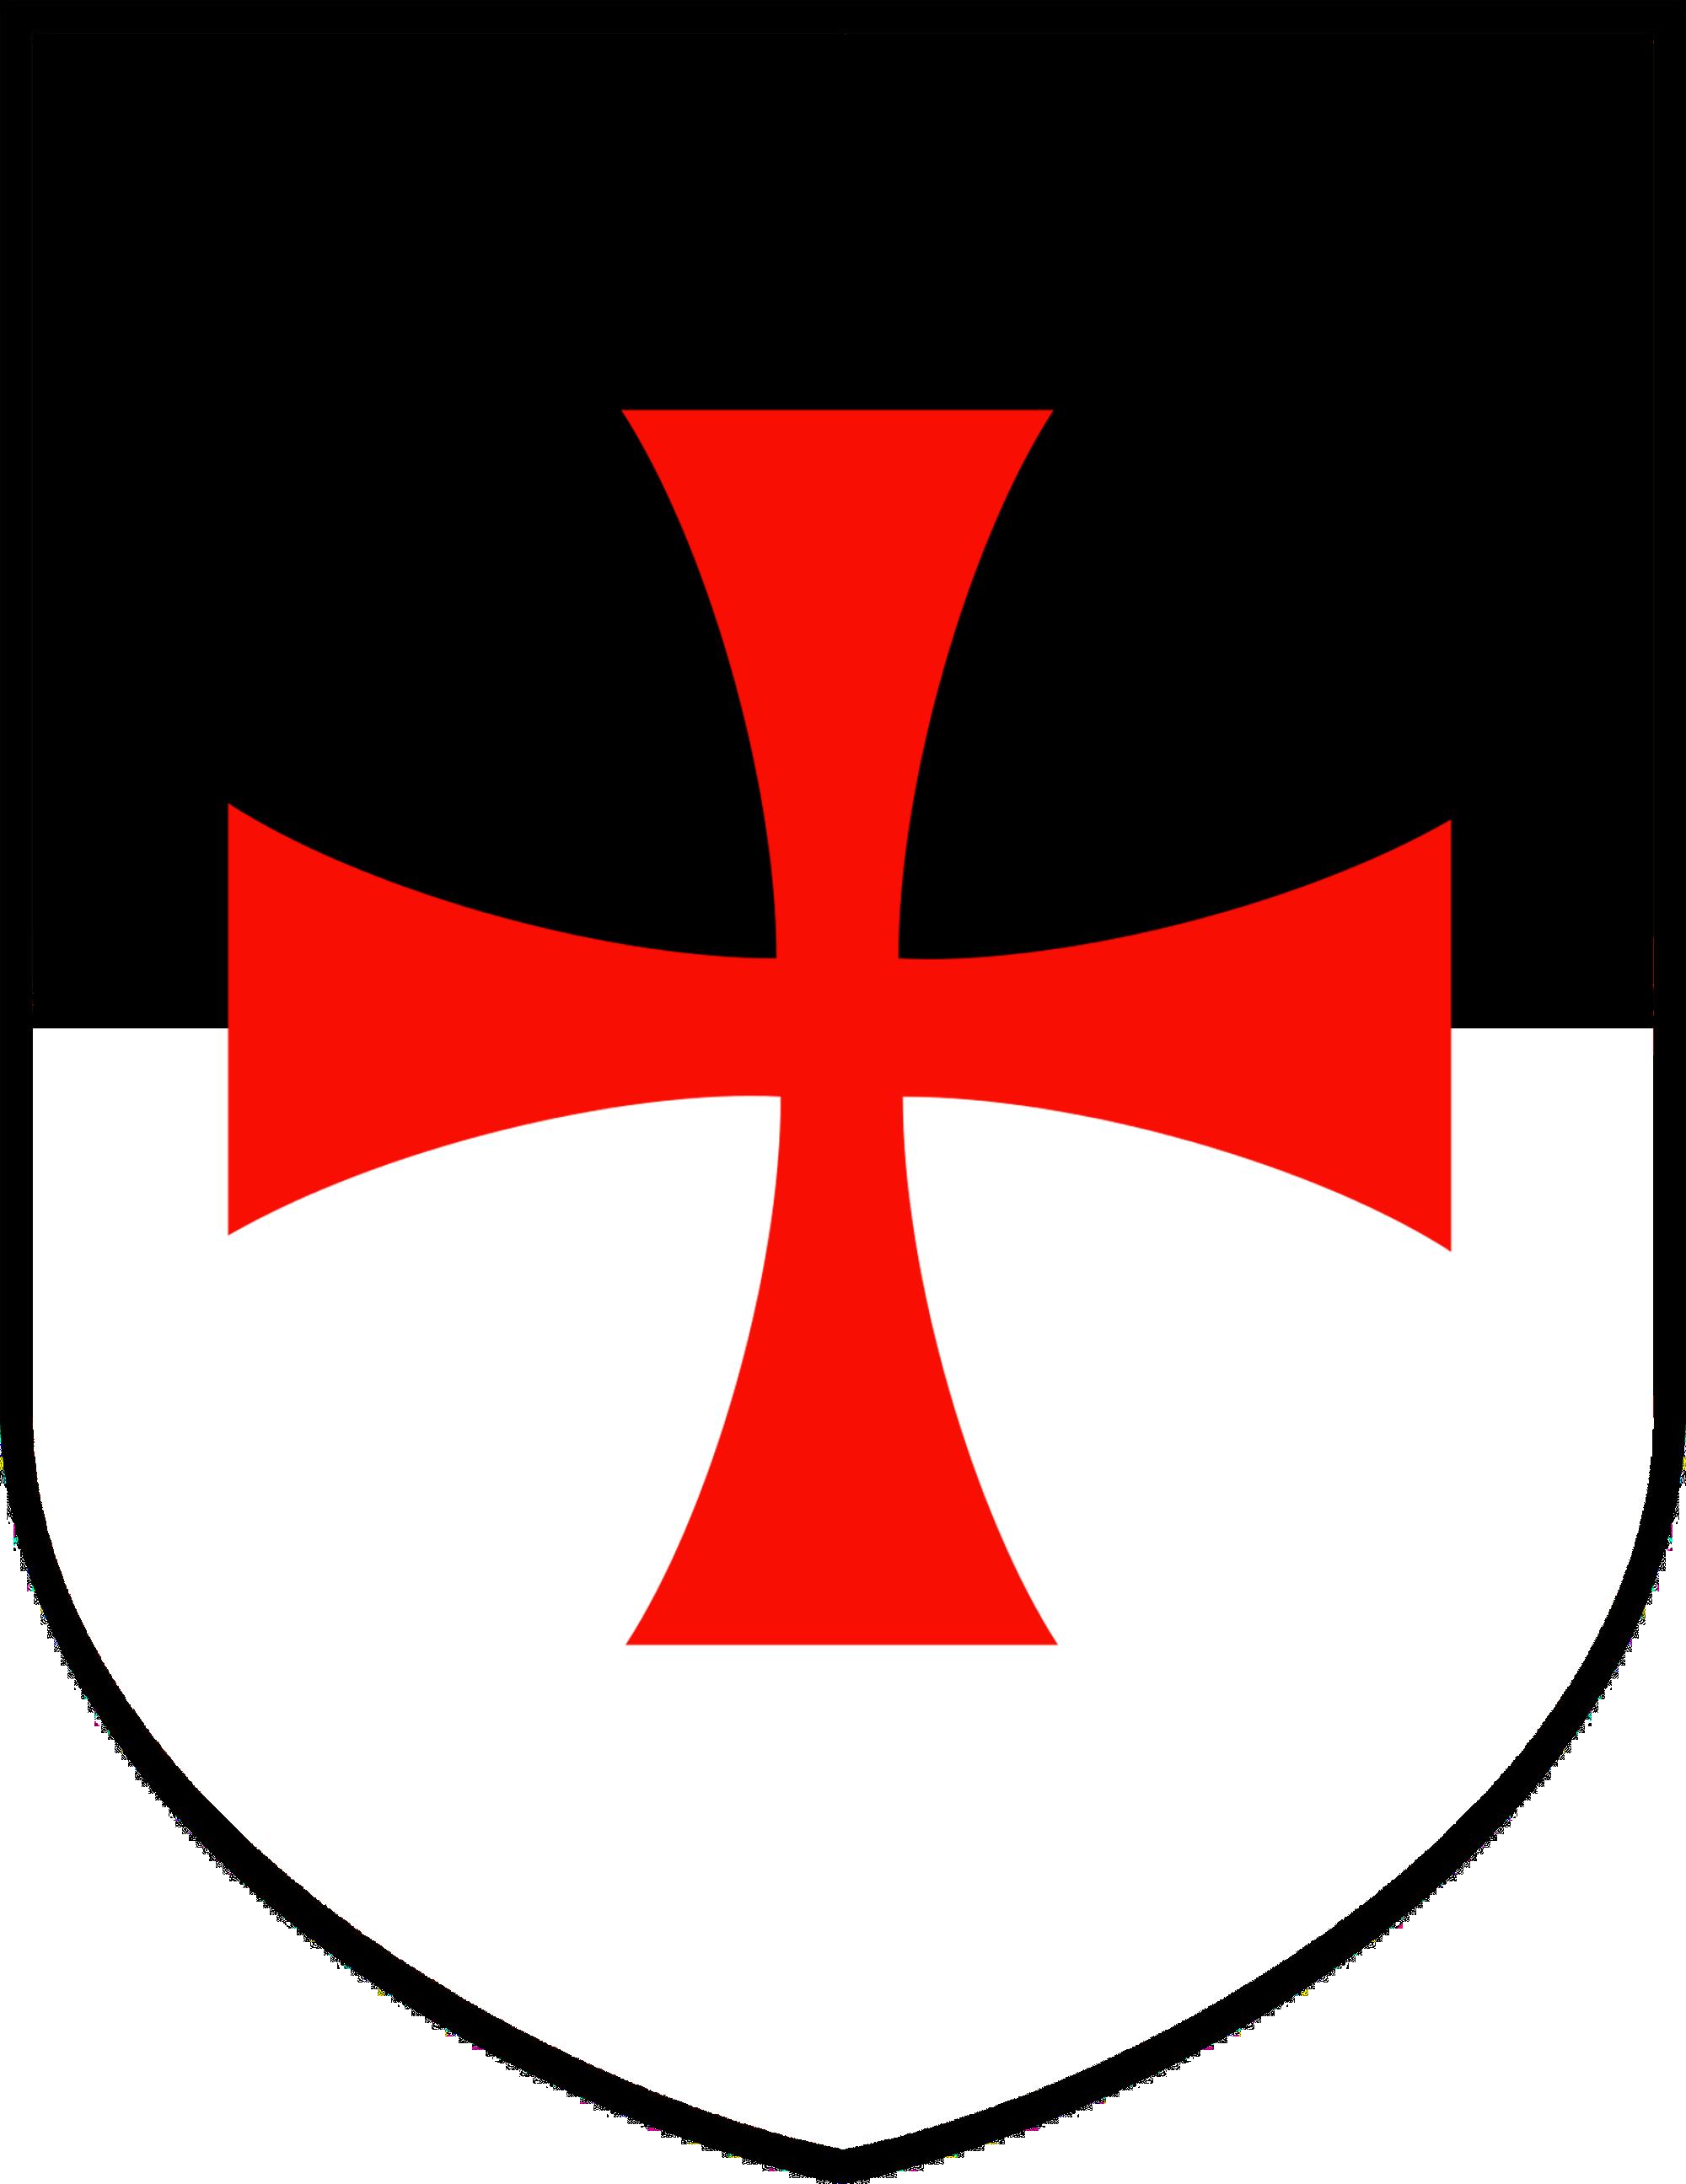 Knights Templar Bezant Shield by williammarshalstore